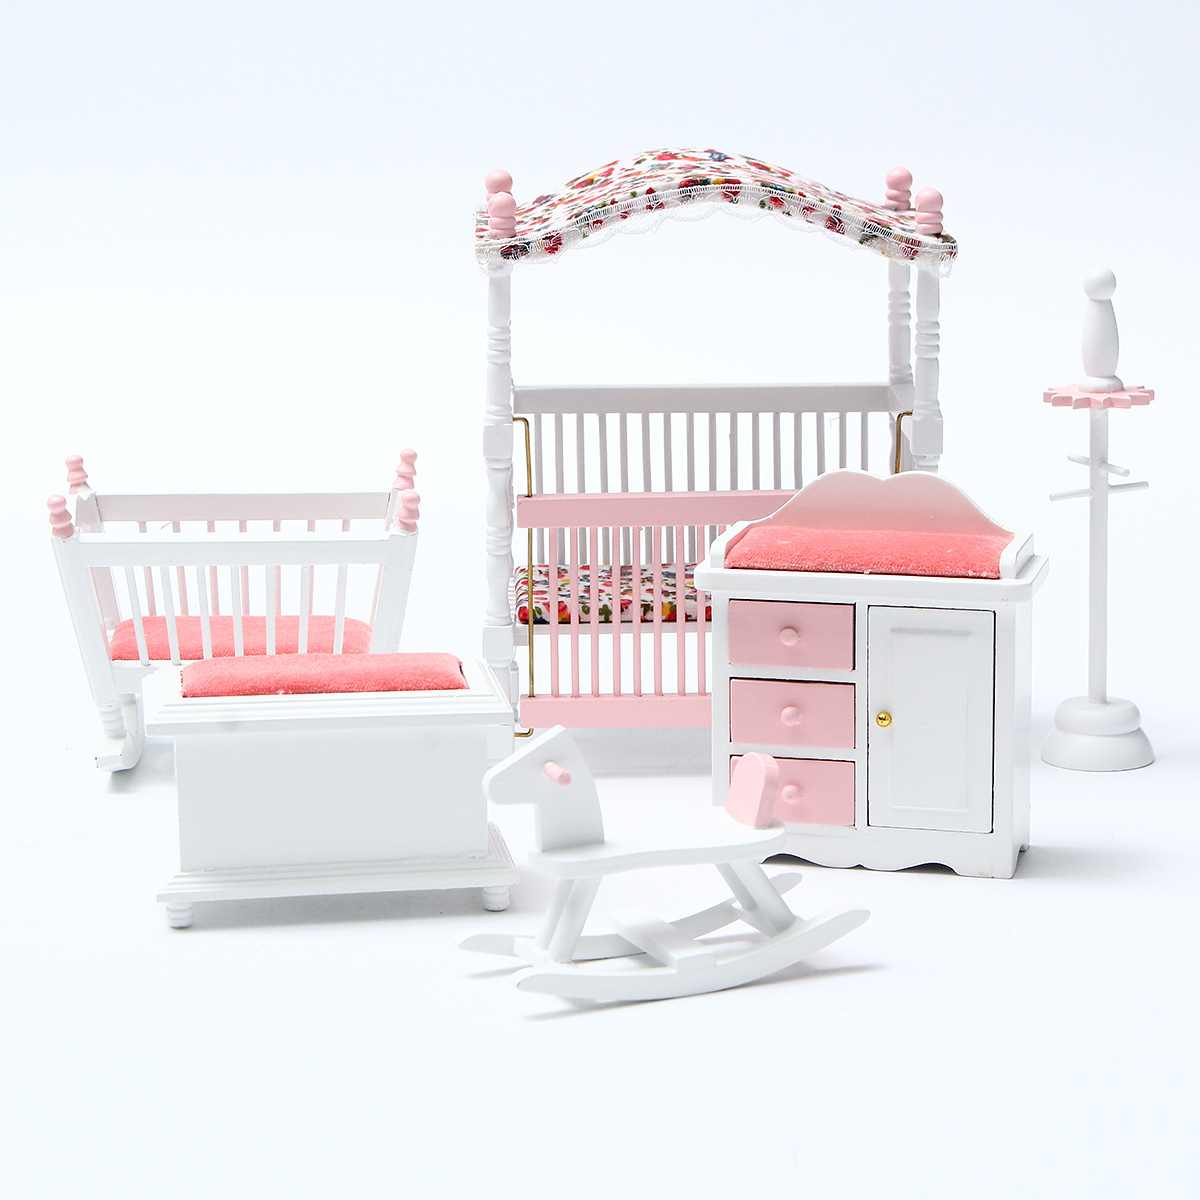 6pcs 1 12 Dollhouse Bedroom Miniature Bedroom Chair Wood European